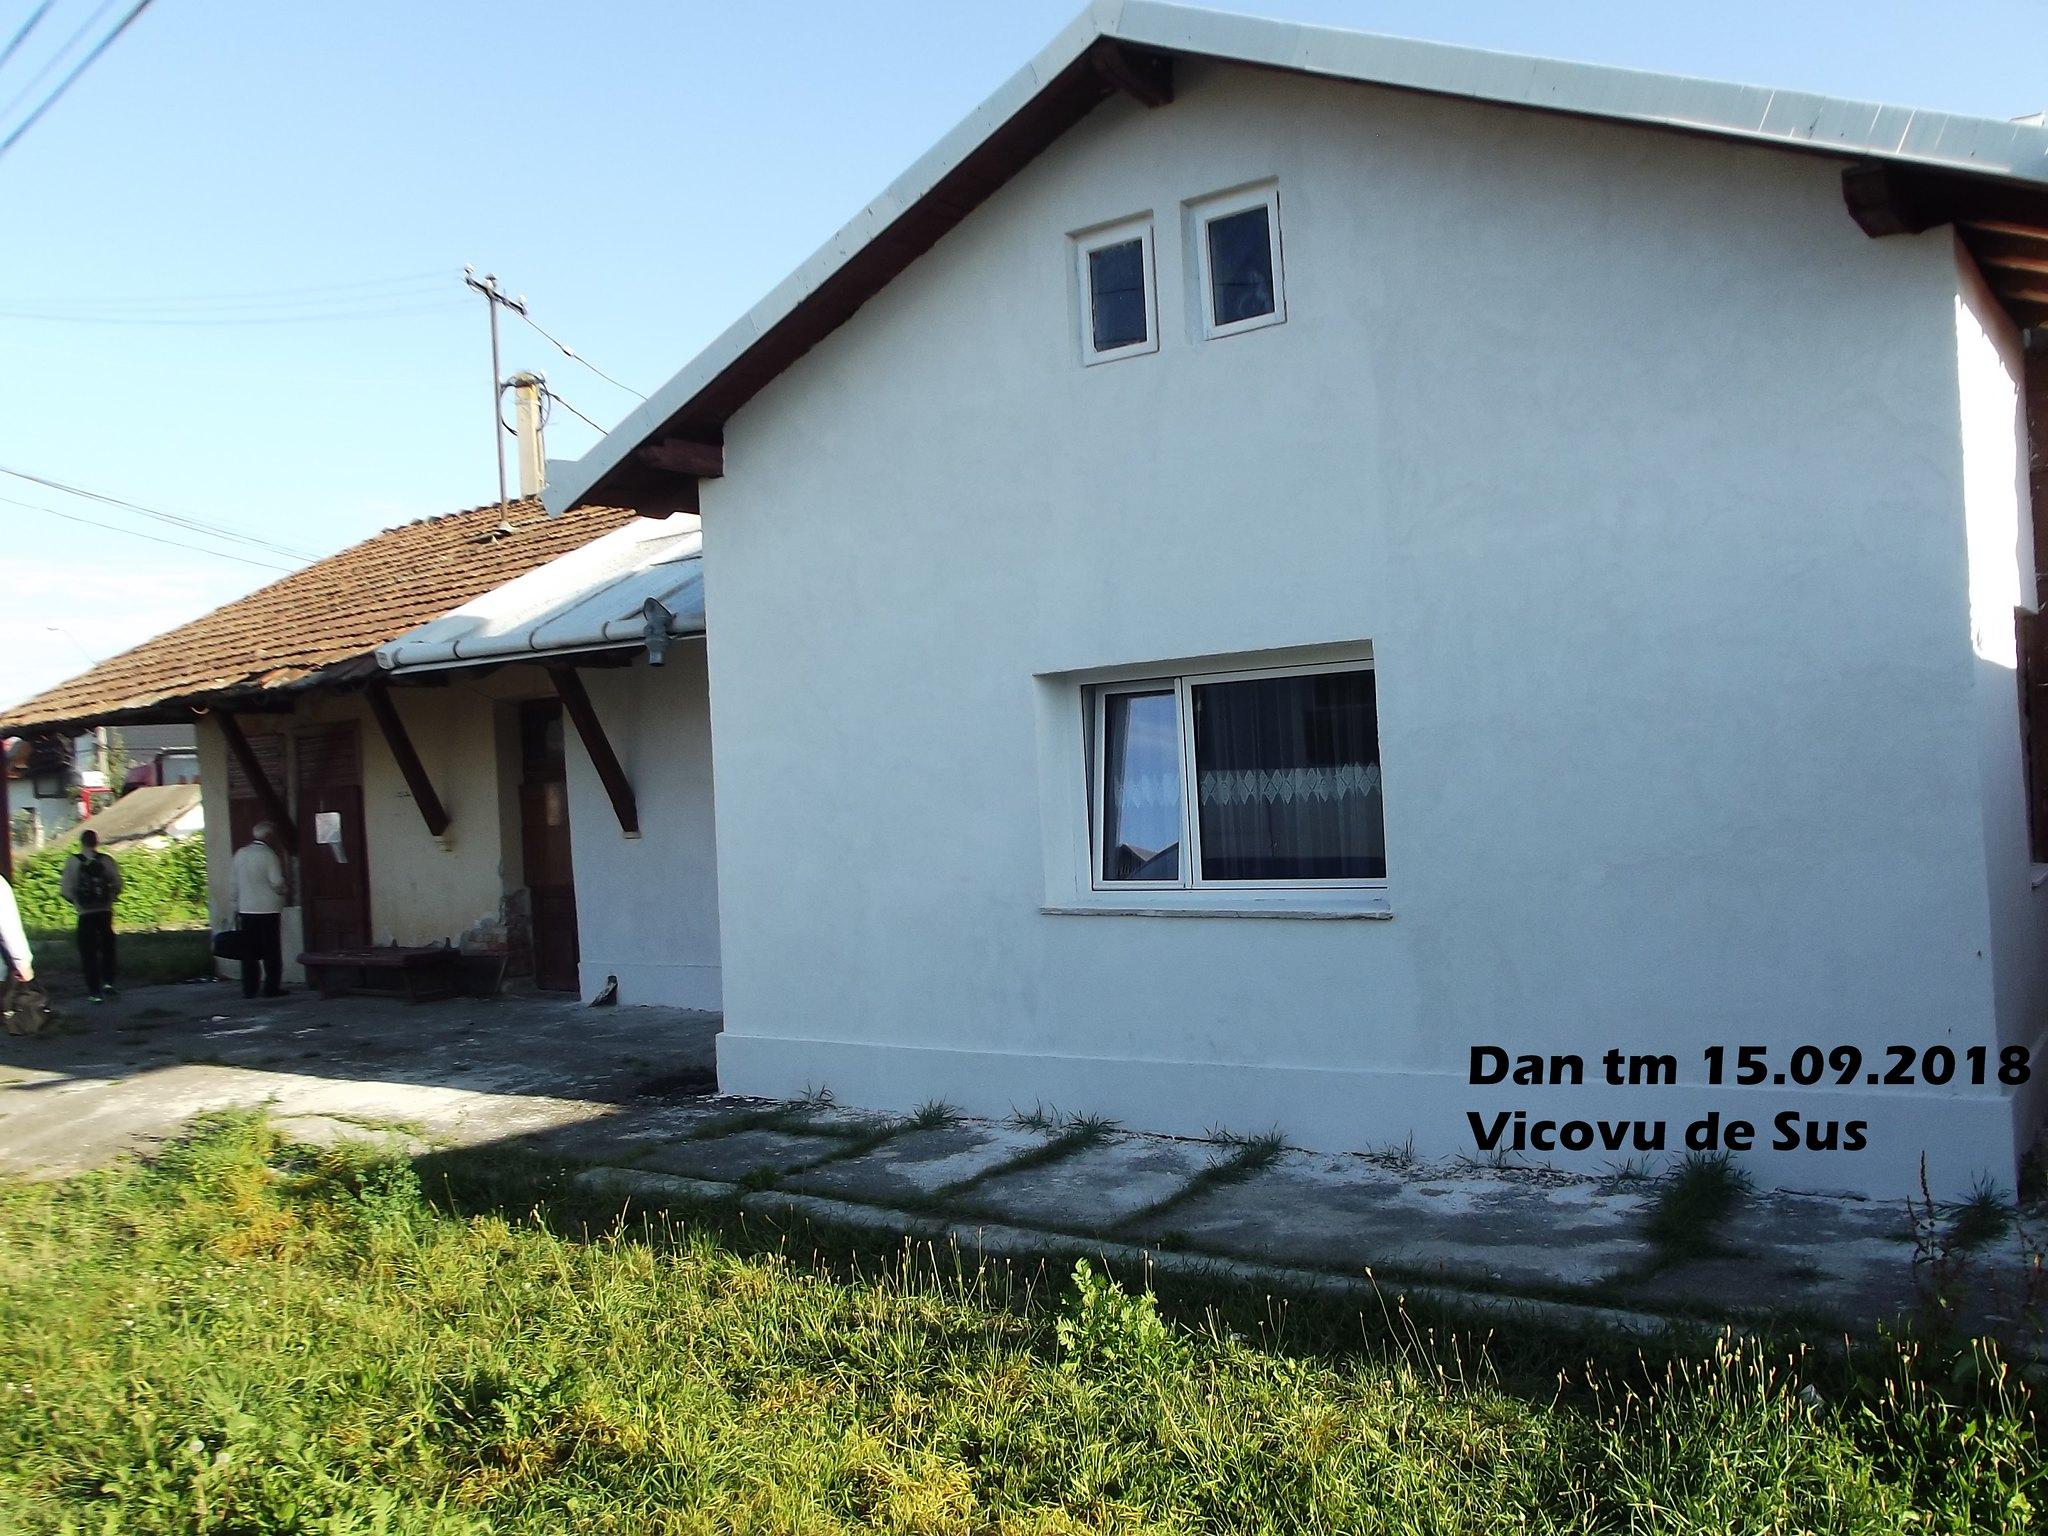 515 : Dorneşti - Gura Putnei - (Putna) - Nisipitu - Seletin UKR - Pagina 47 44685369072_a215a7d29e_k